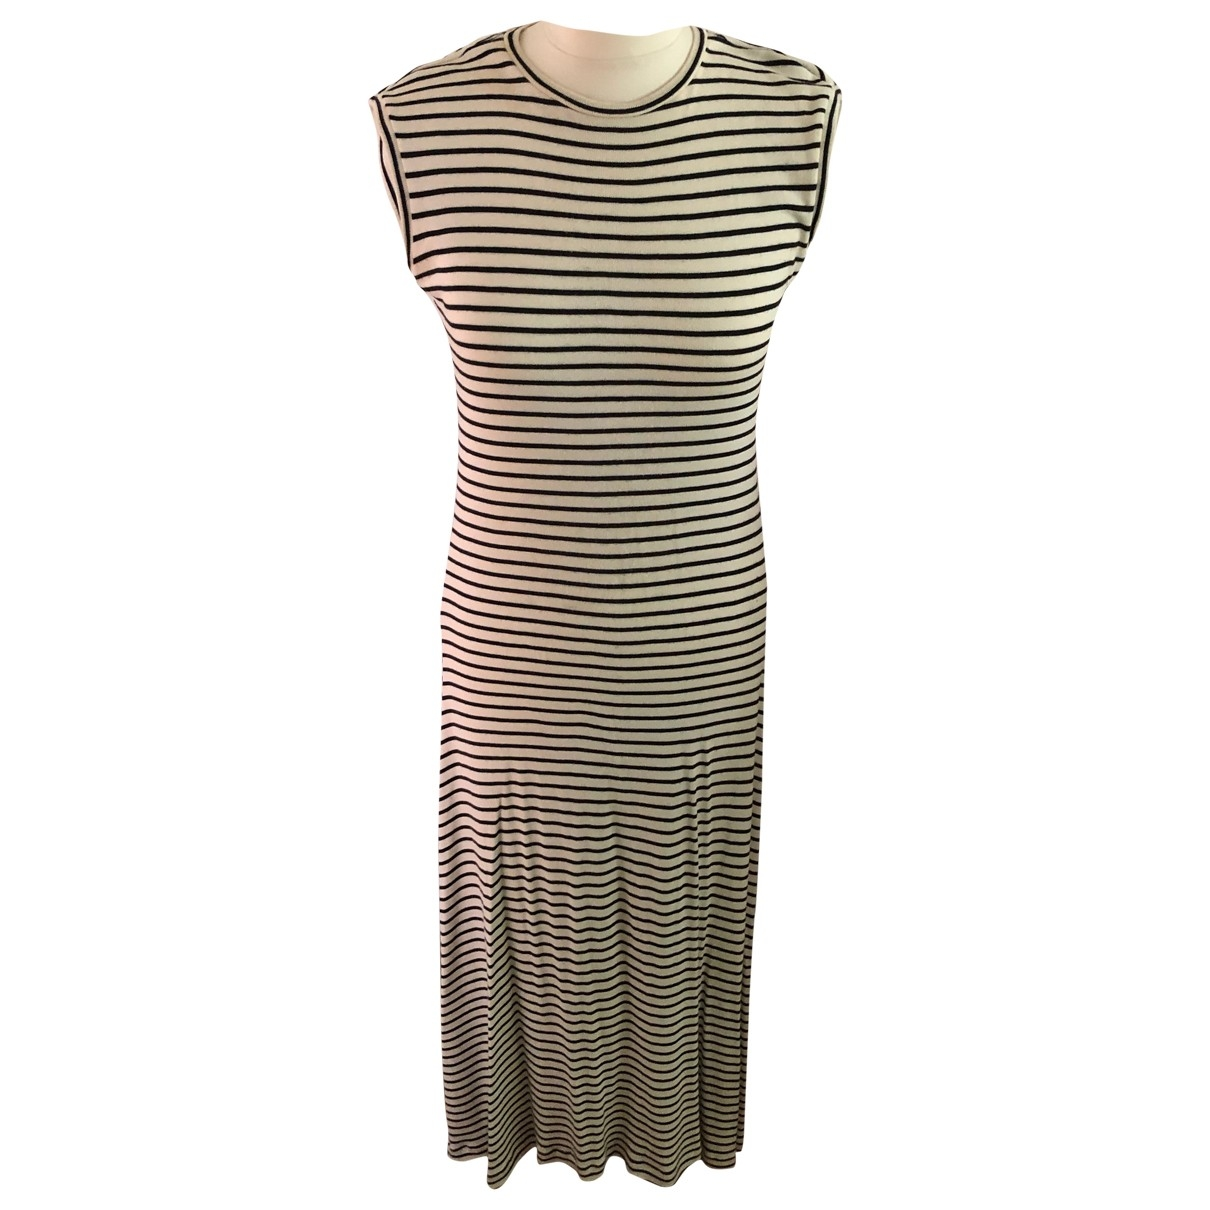 Ralph Lauren \N Cotton - elasthane dress for Women L International